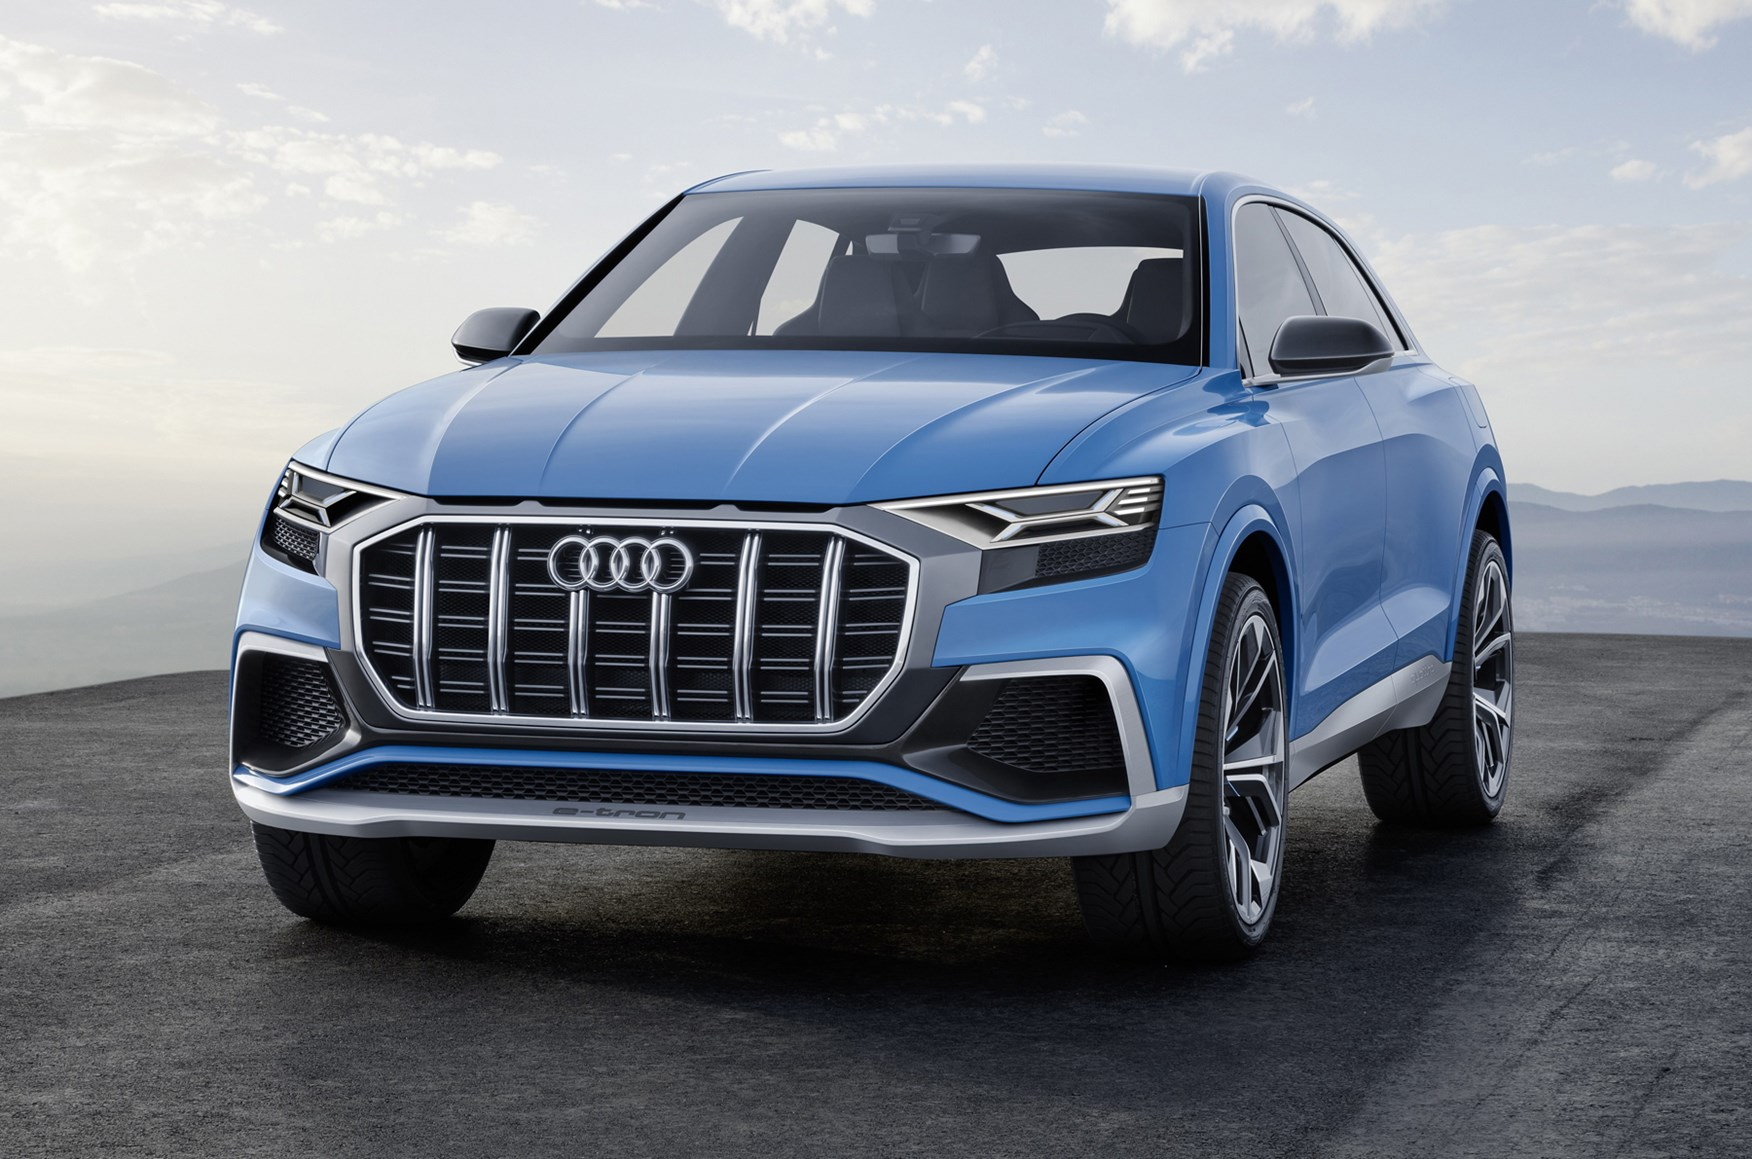 Audi Q8 SUV Review